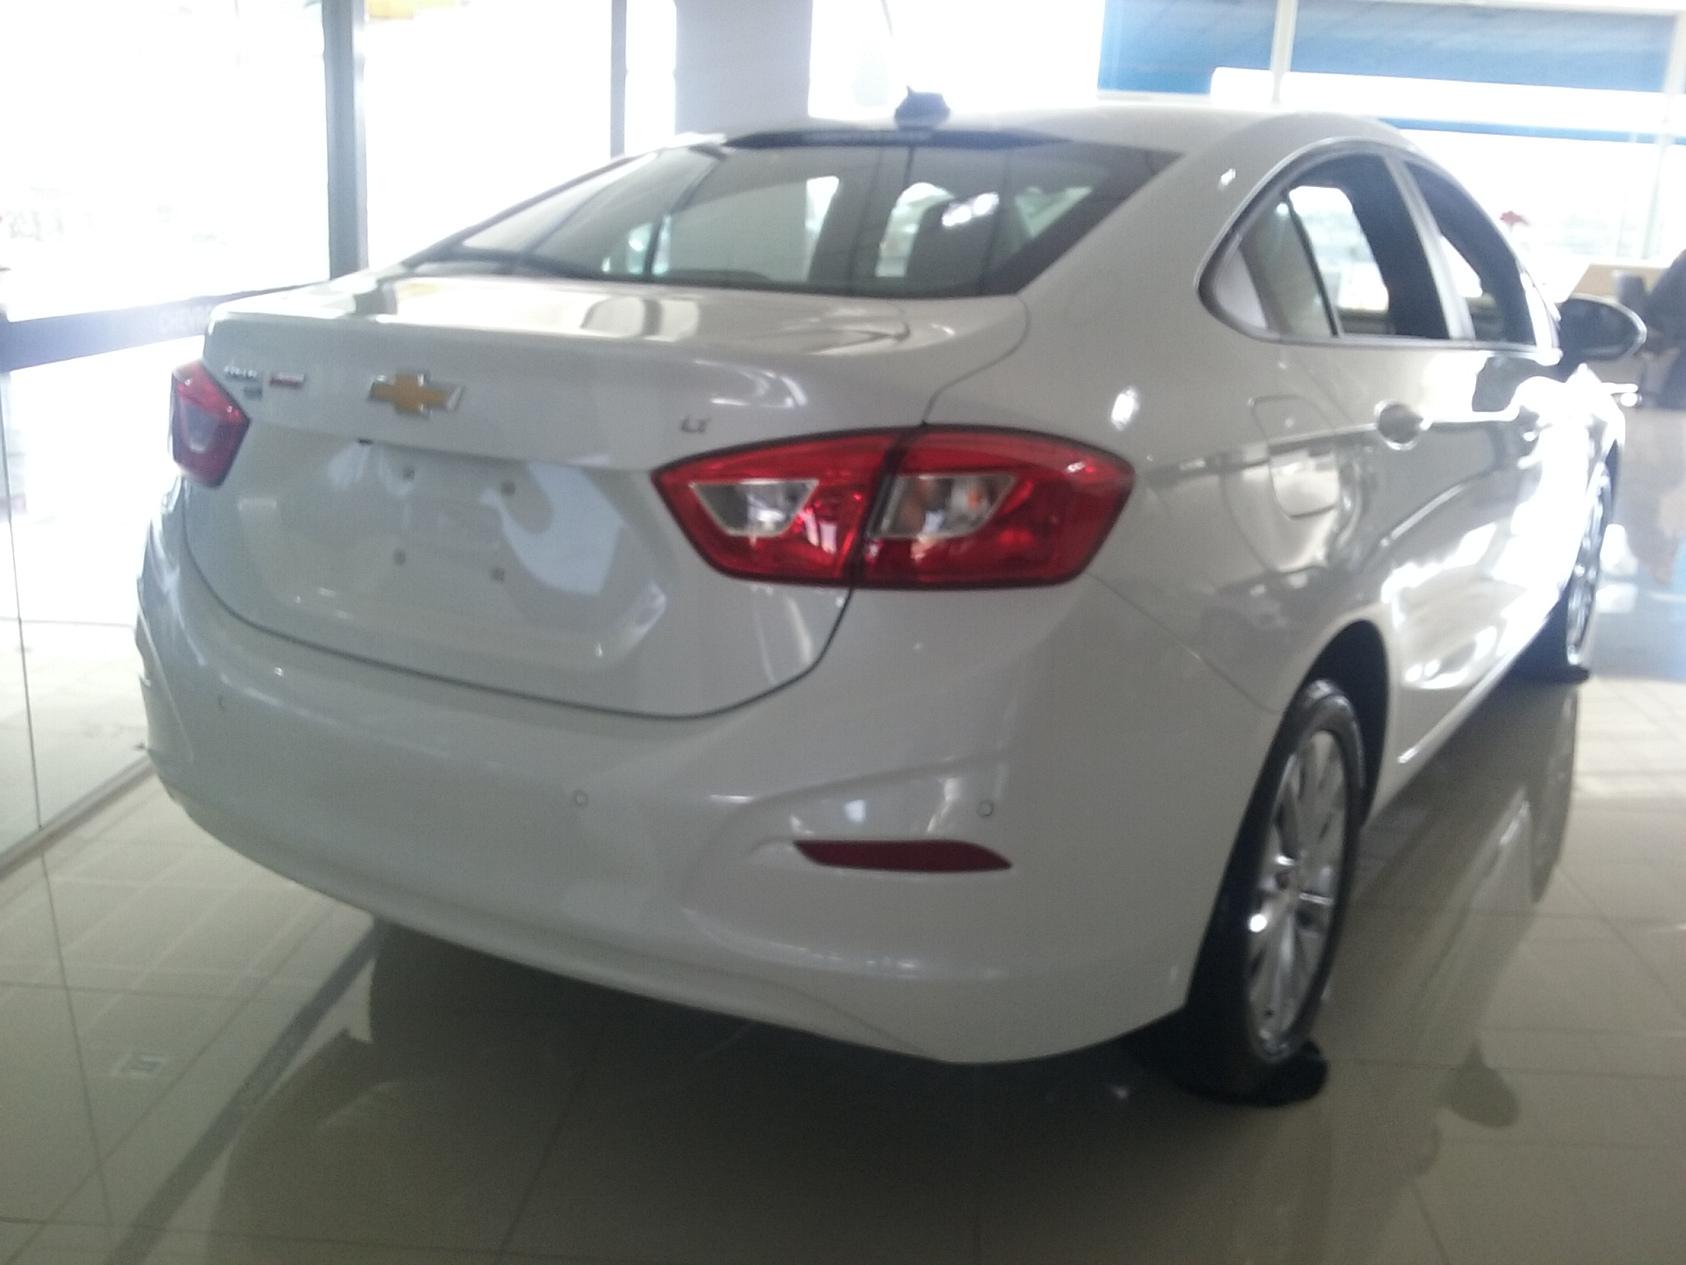 Chevrolet CRUZE LT 1.4L 2018